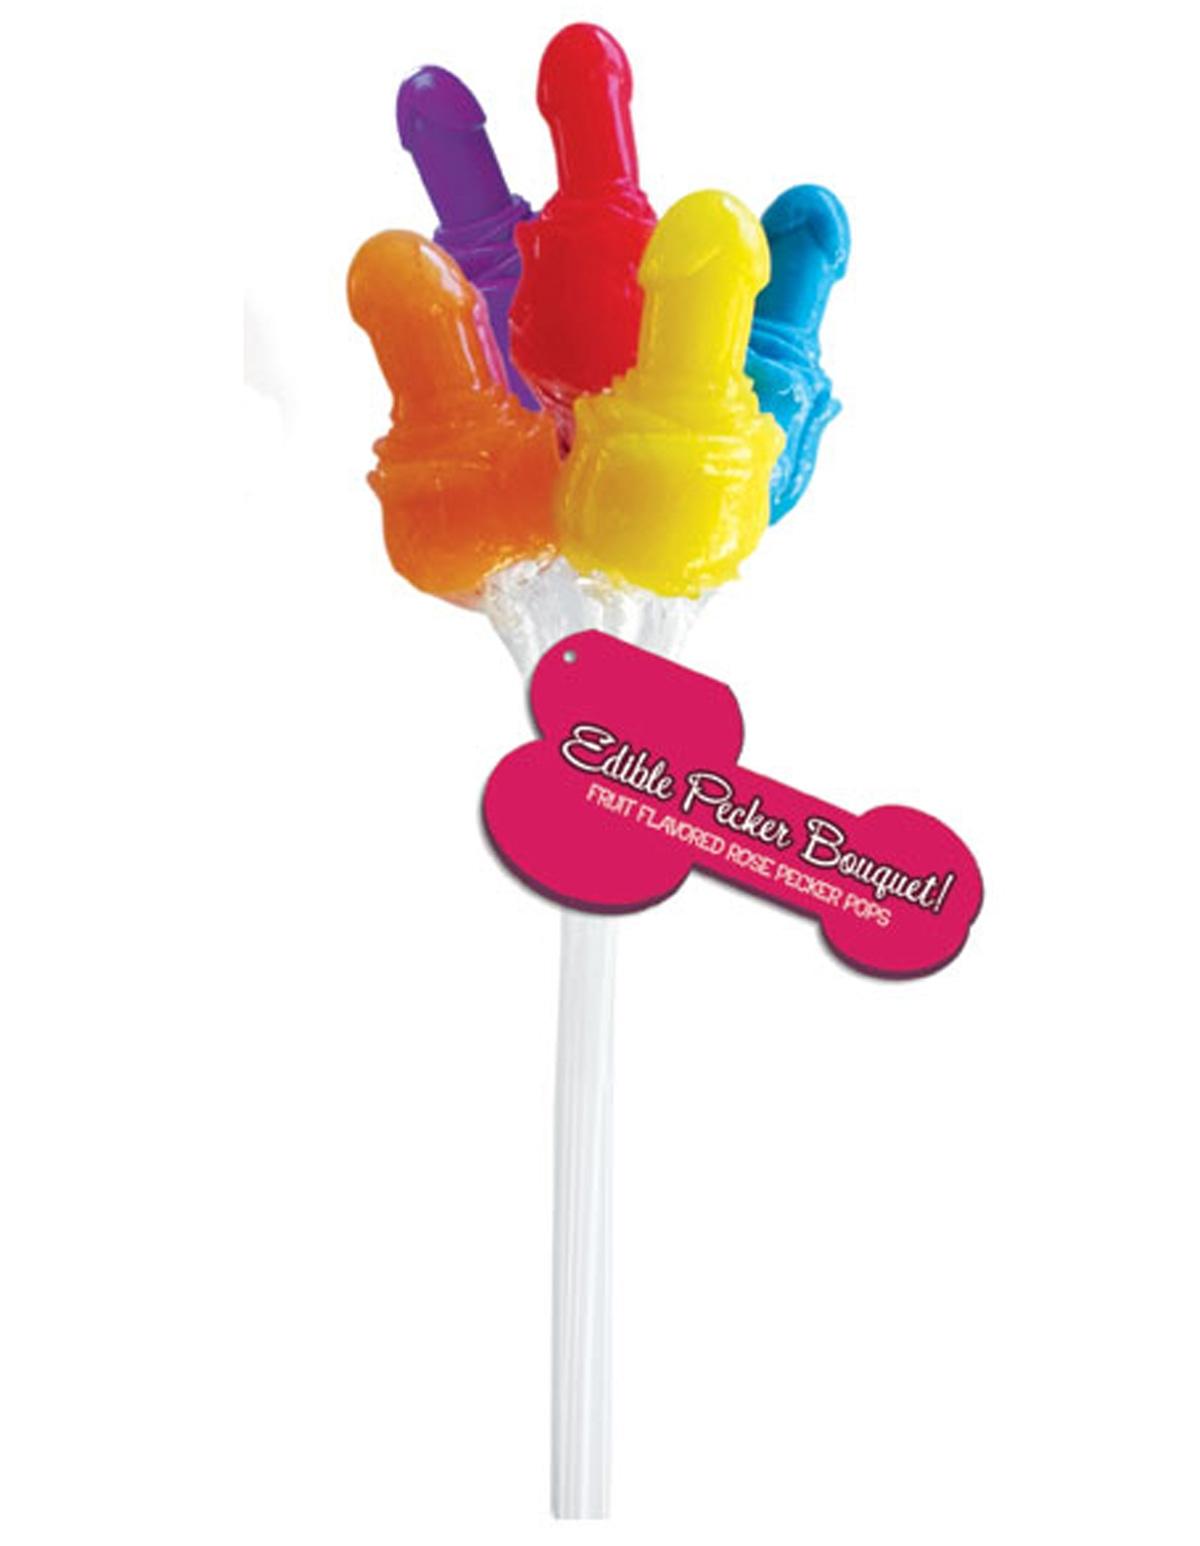 Pecker Candy Bouquet Suckers